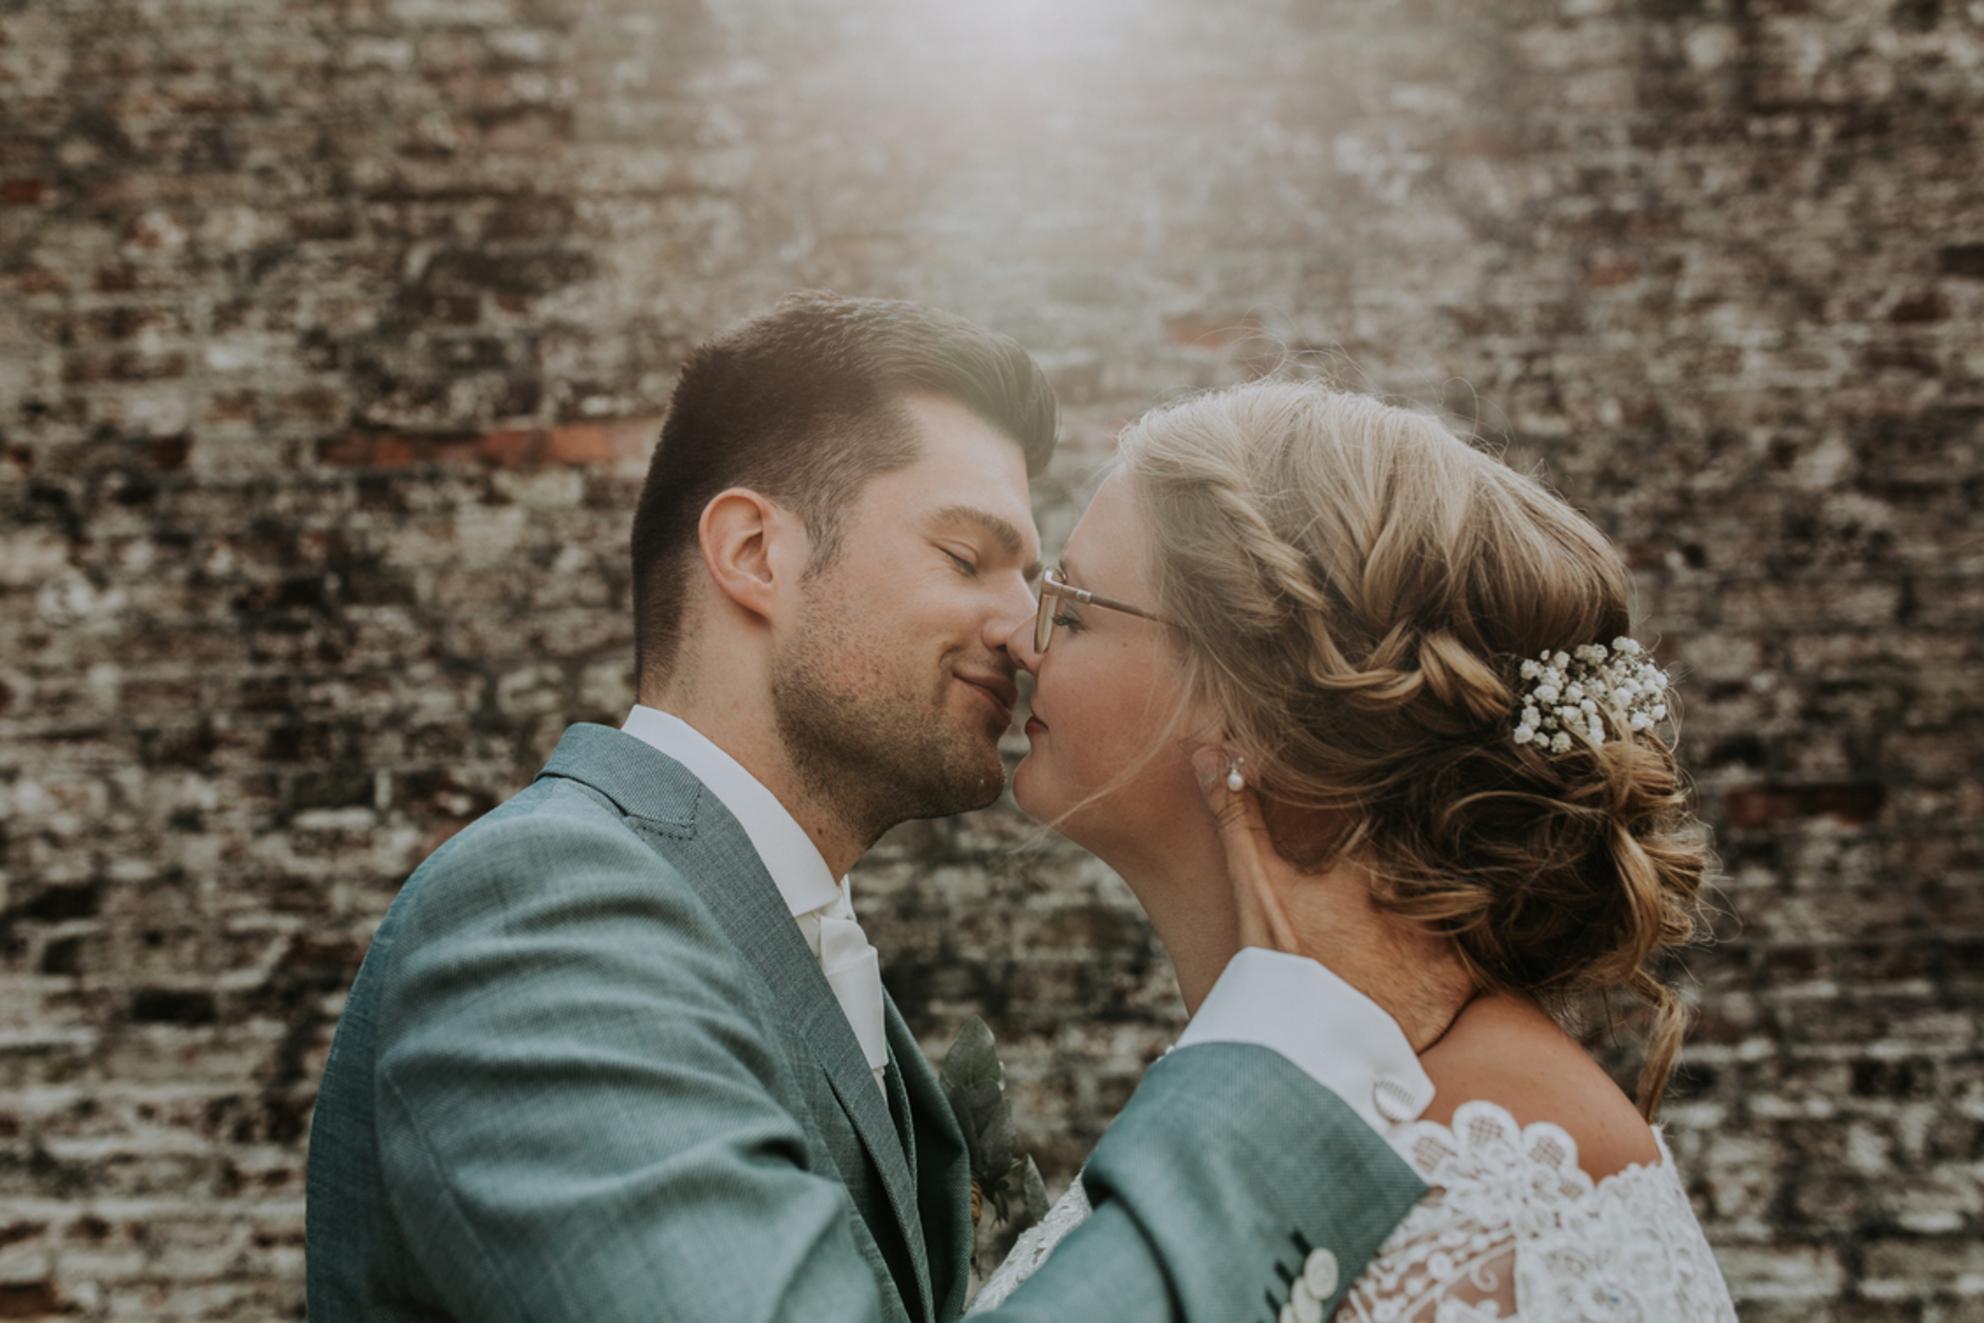 WEDDING OF J + W - - - foto door daniellephotography op 04-09-2018 - deze foto bevat: man, vrouw, licht, portret, liefde, tegenlicht, daglicht, lief, beauty, emotie, bruid, bruiloft, blond, closeup, bruidegom, visagie, 50mm, 35mm